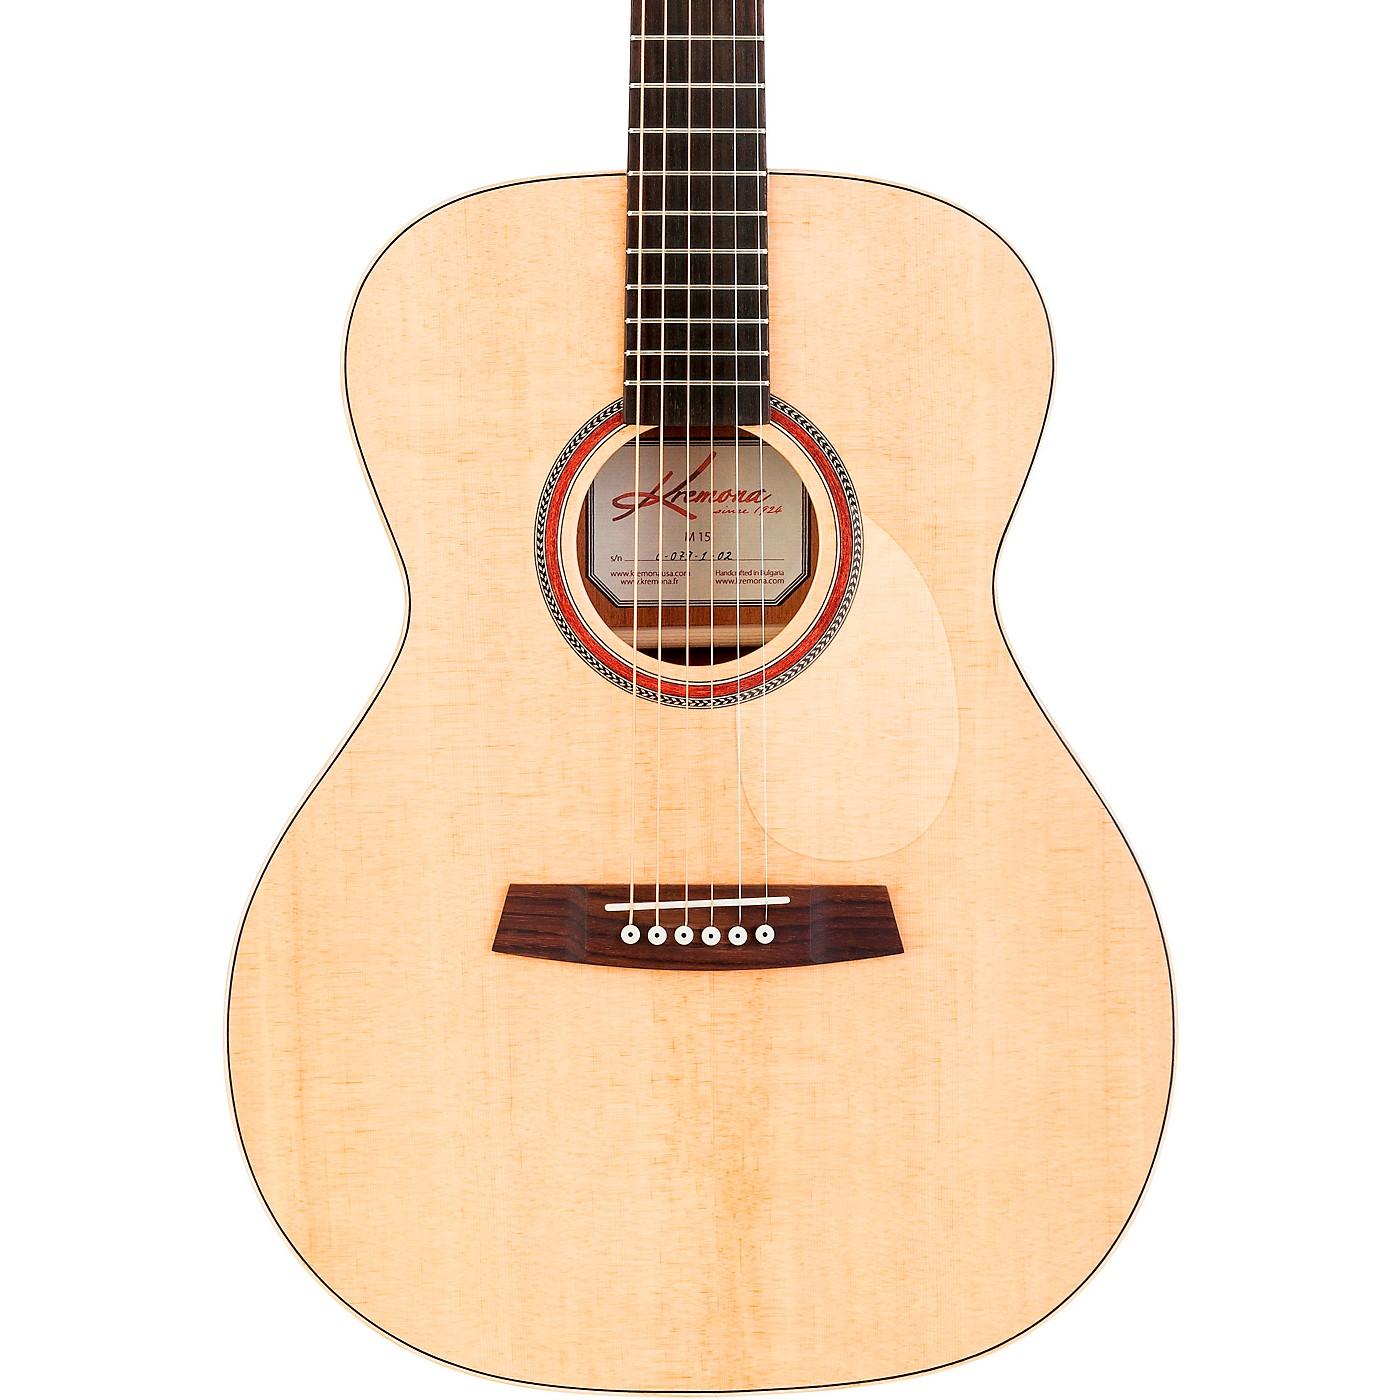 Kremona Kremona M15 OM-Style Acoustic Guitar thumbnail